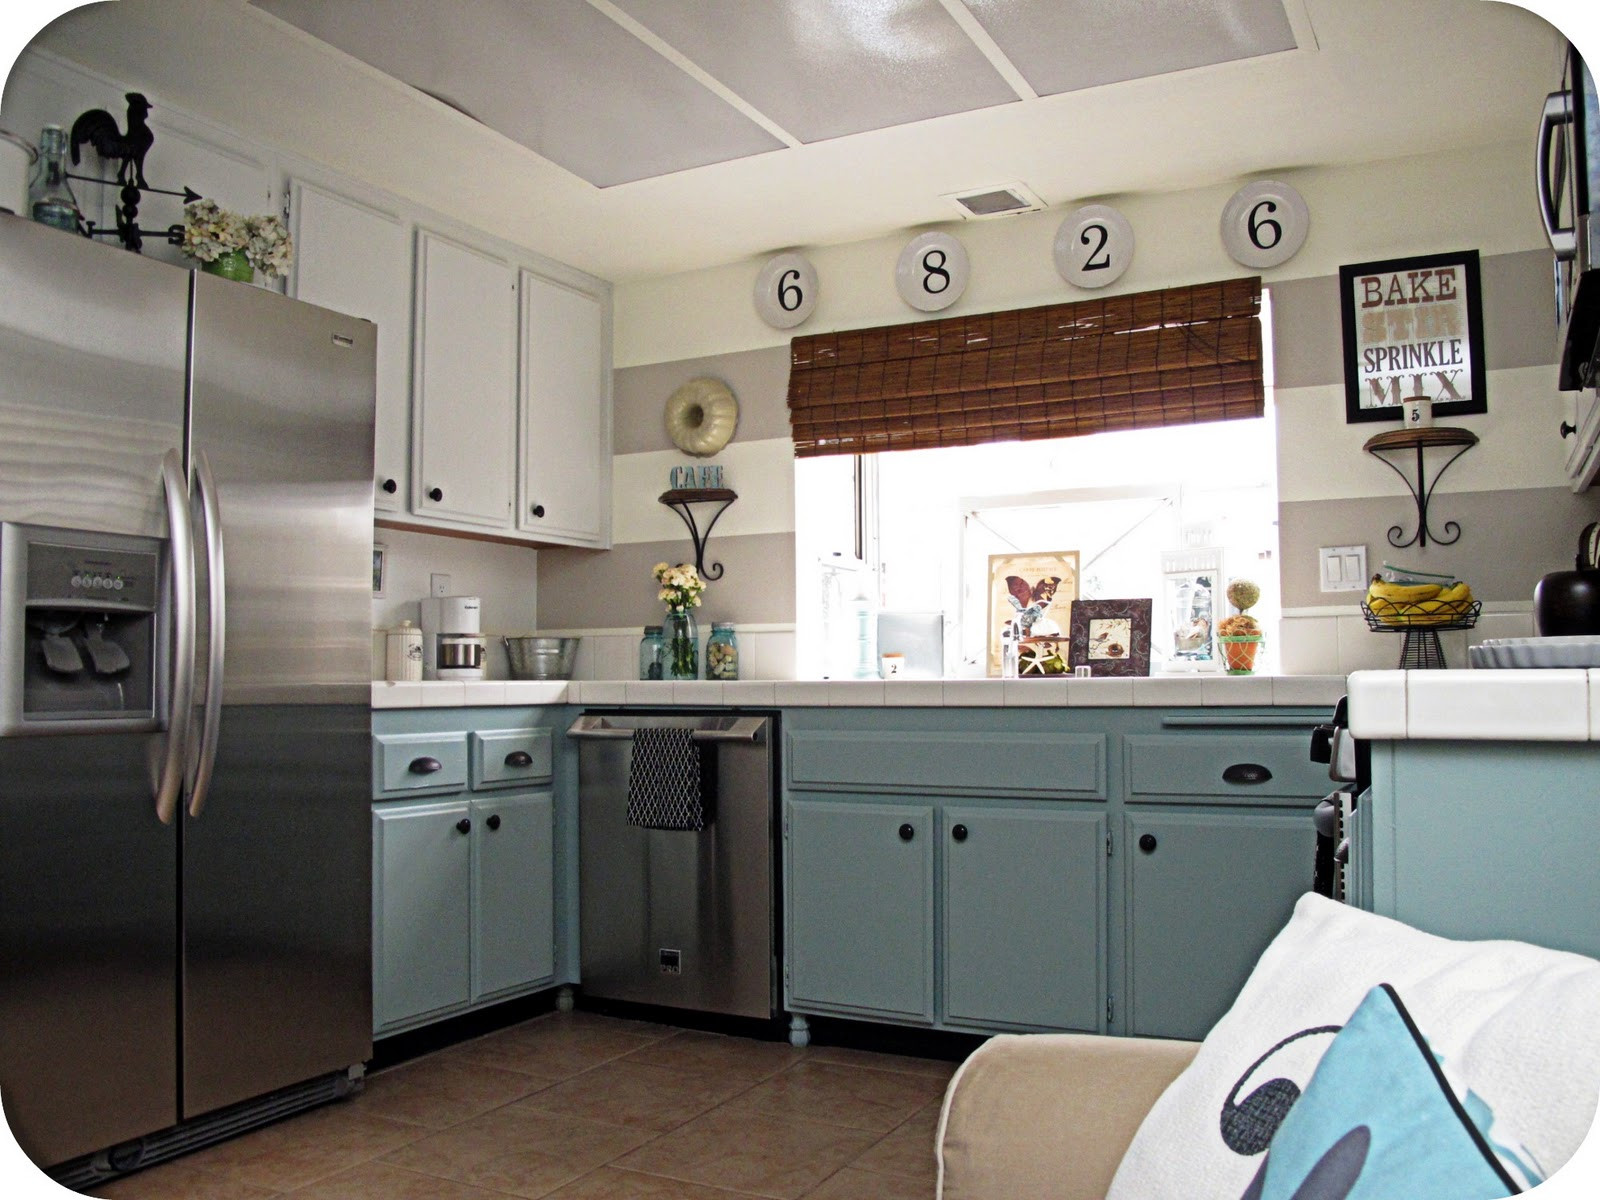 Best ideas about Antique Kitchen Decor . Save or Pin Vintage Kitchen Decorating Ideas Now.